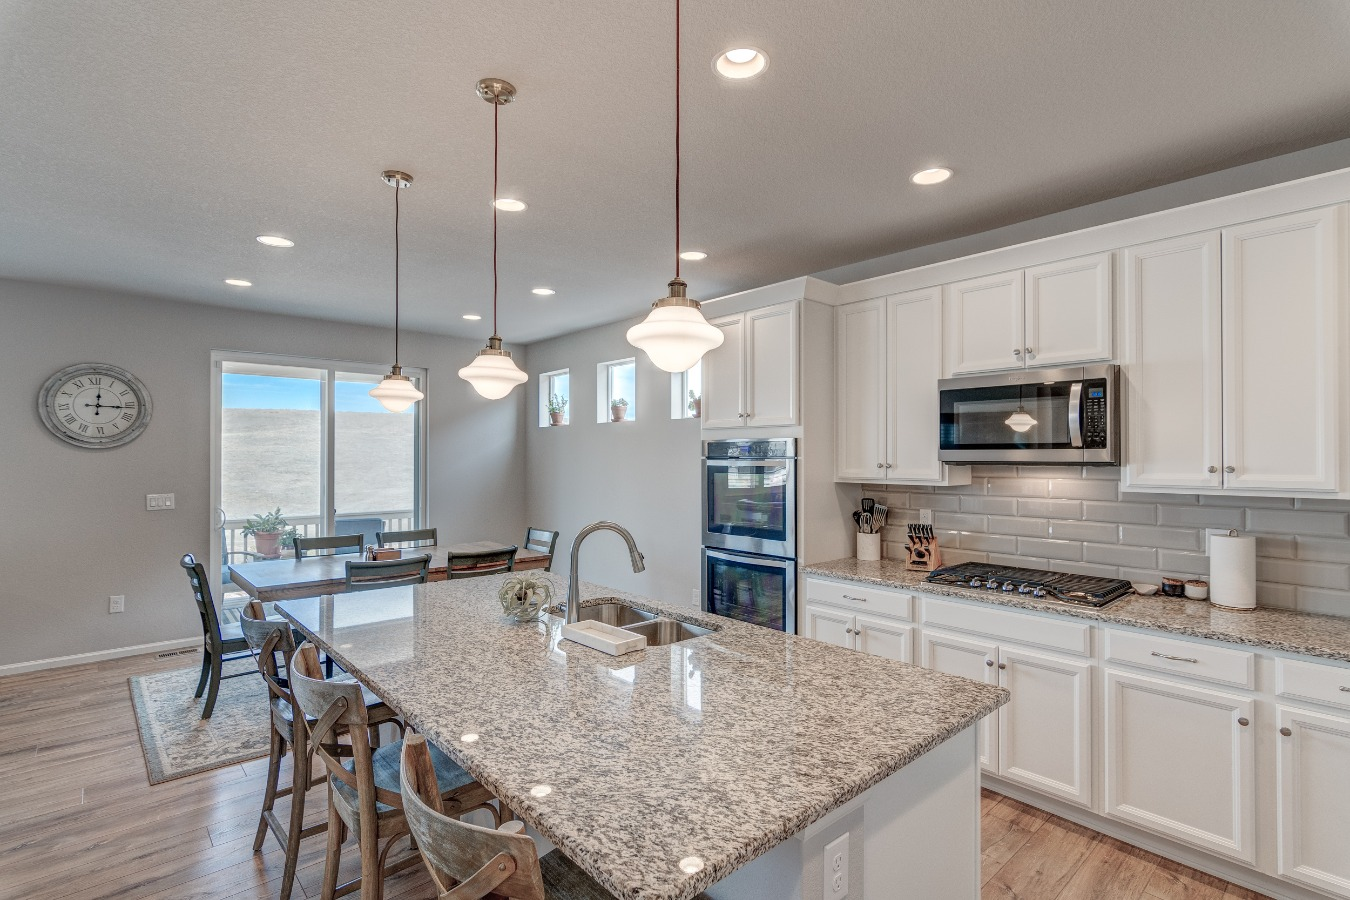 Sleek Granite & stainless steel  Kitchen